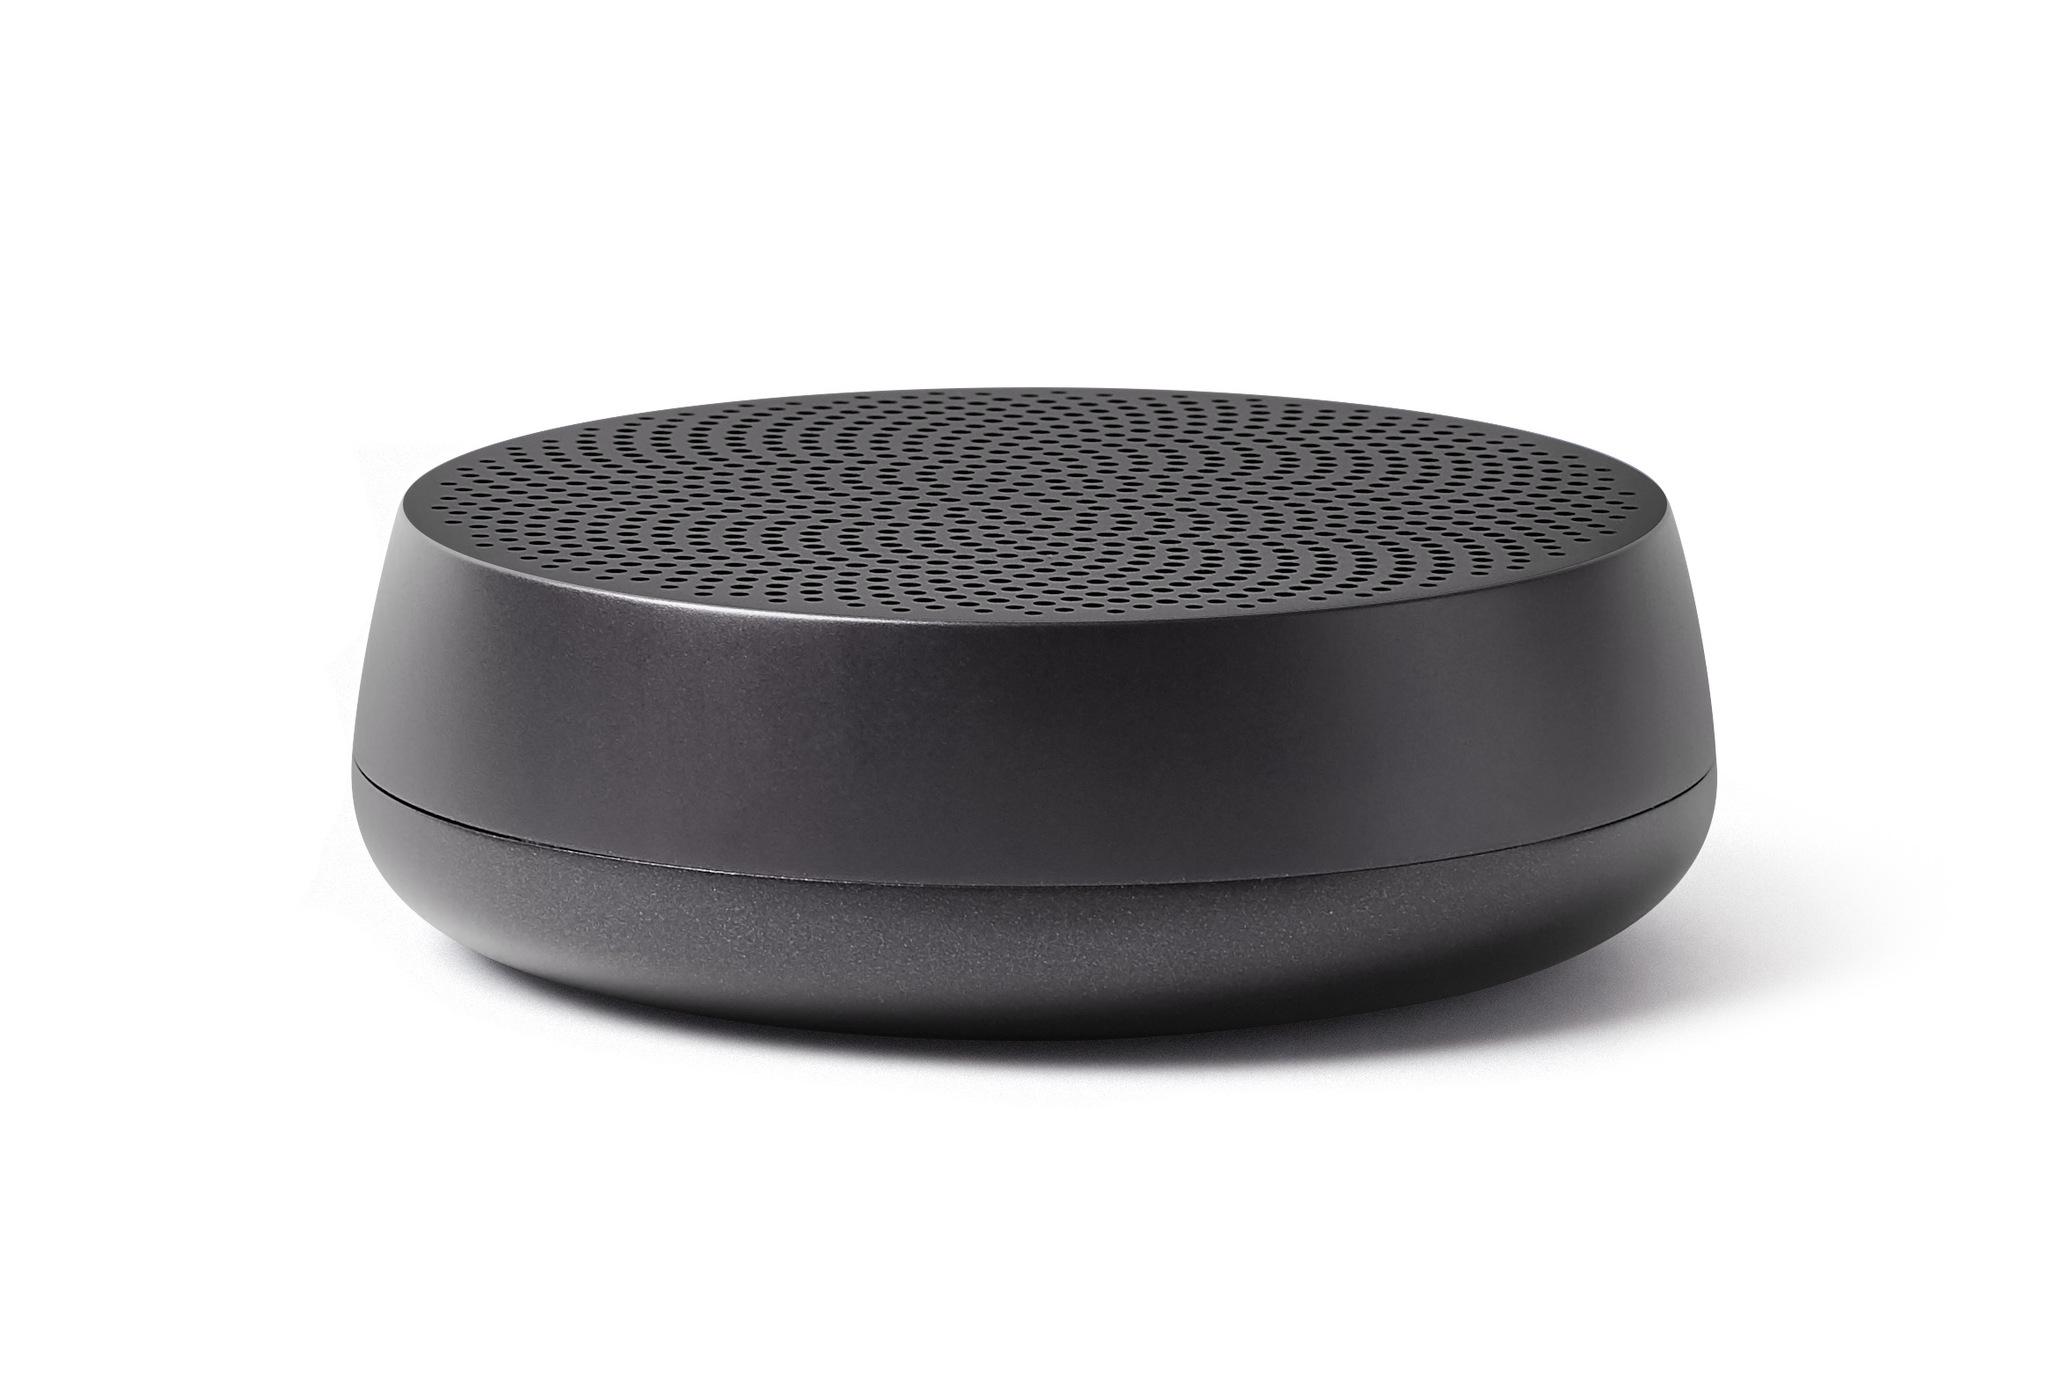 Mini-Bluetooth-Lautsprecher 5W, Anthrazit / Alumin